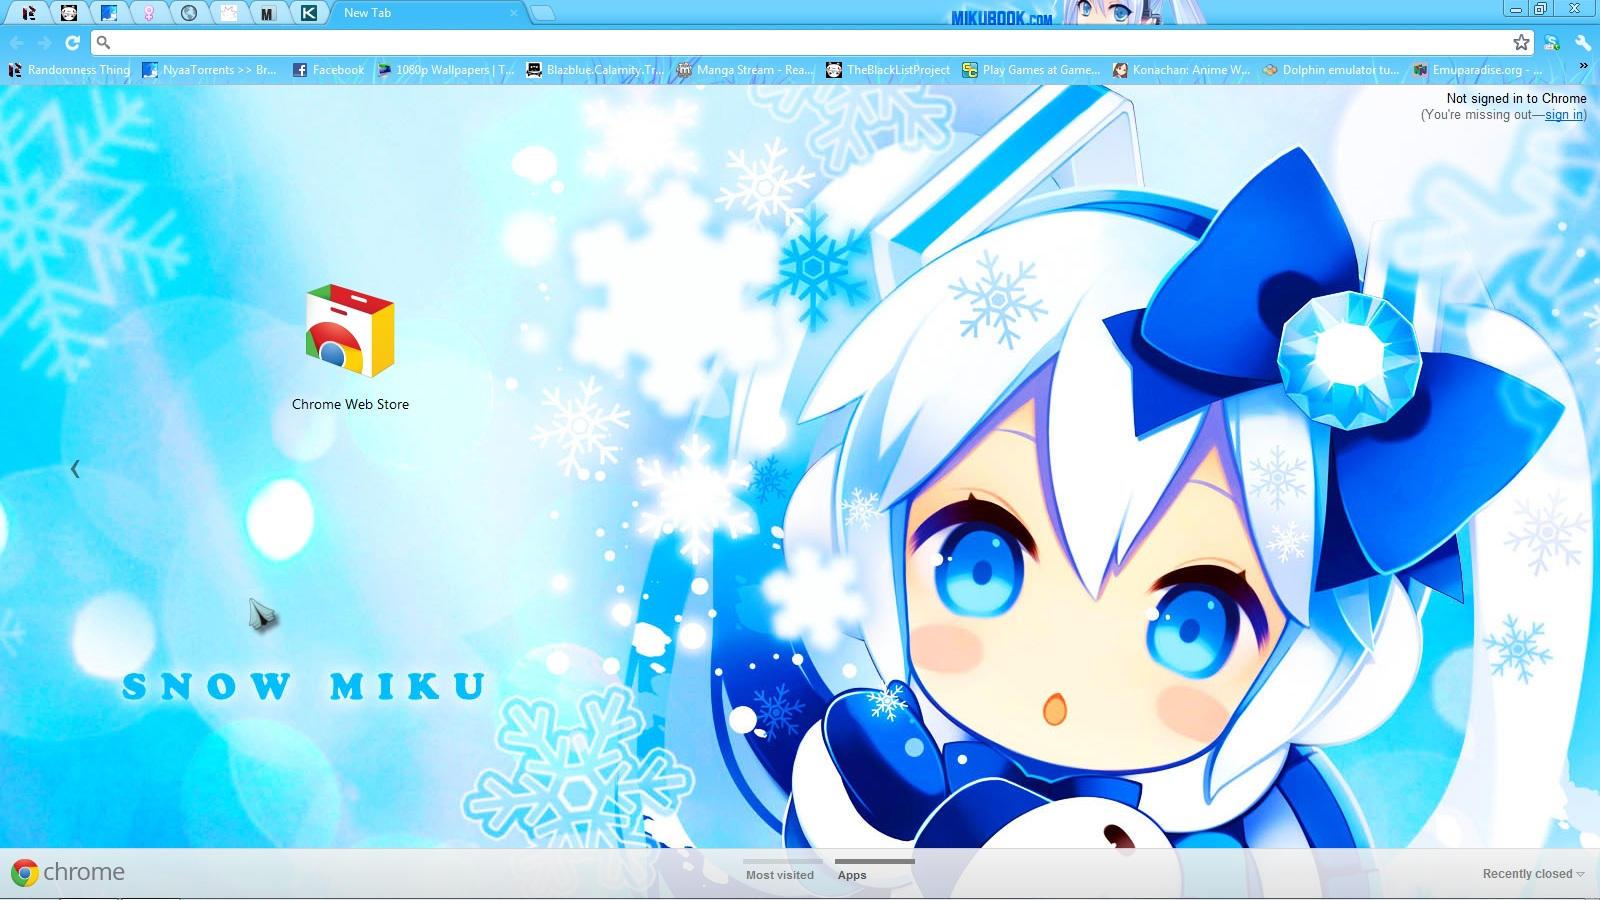 Google themes hatsune miku - Snow Miku Hatsune Theme By Adventkai